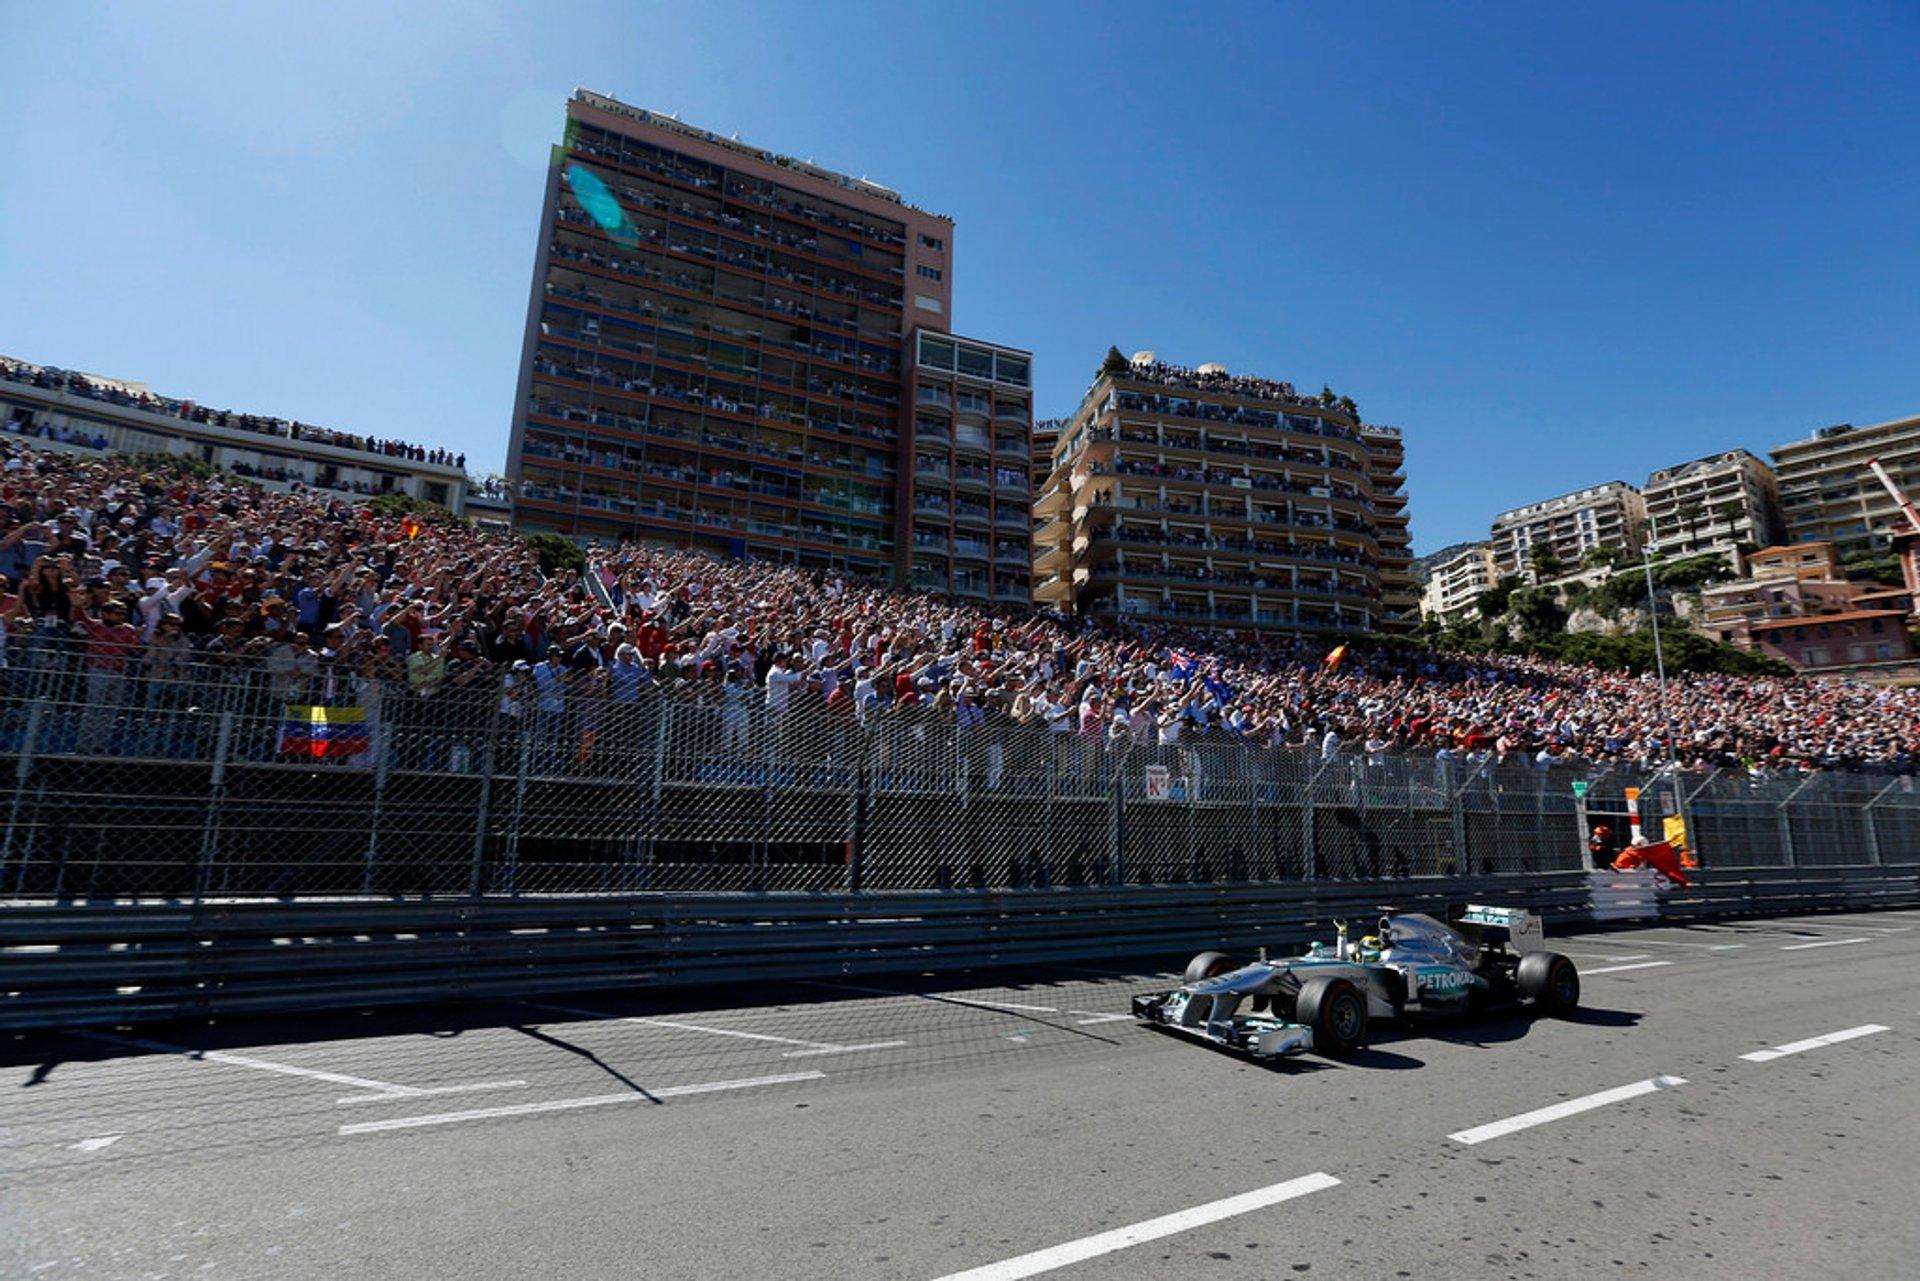 Best time to see F1 Monaco Grand Prix in Monaco 2019